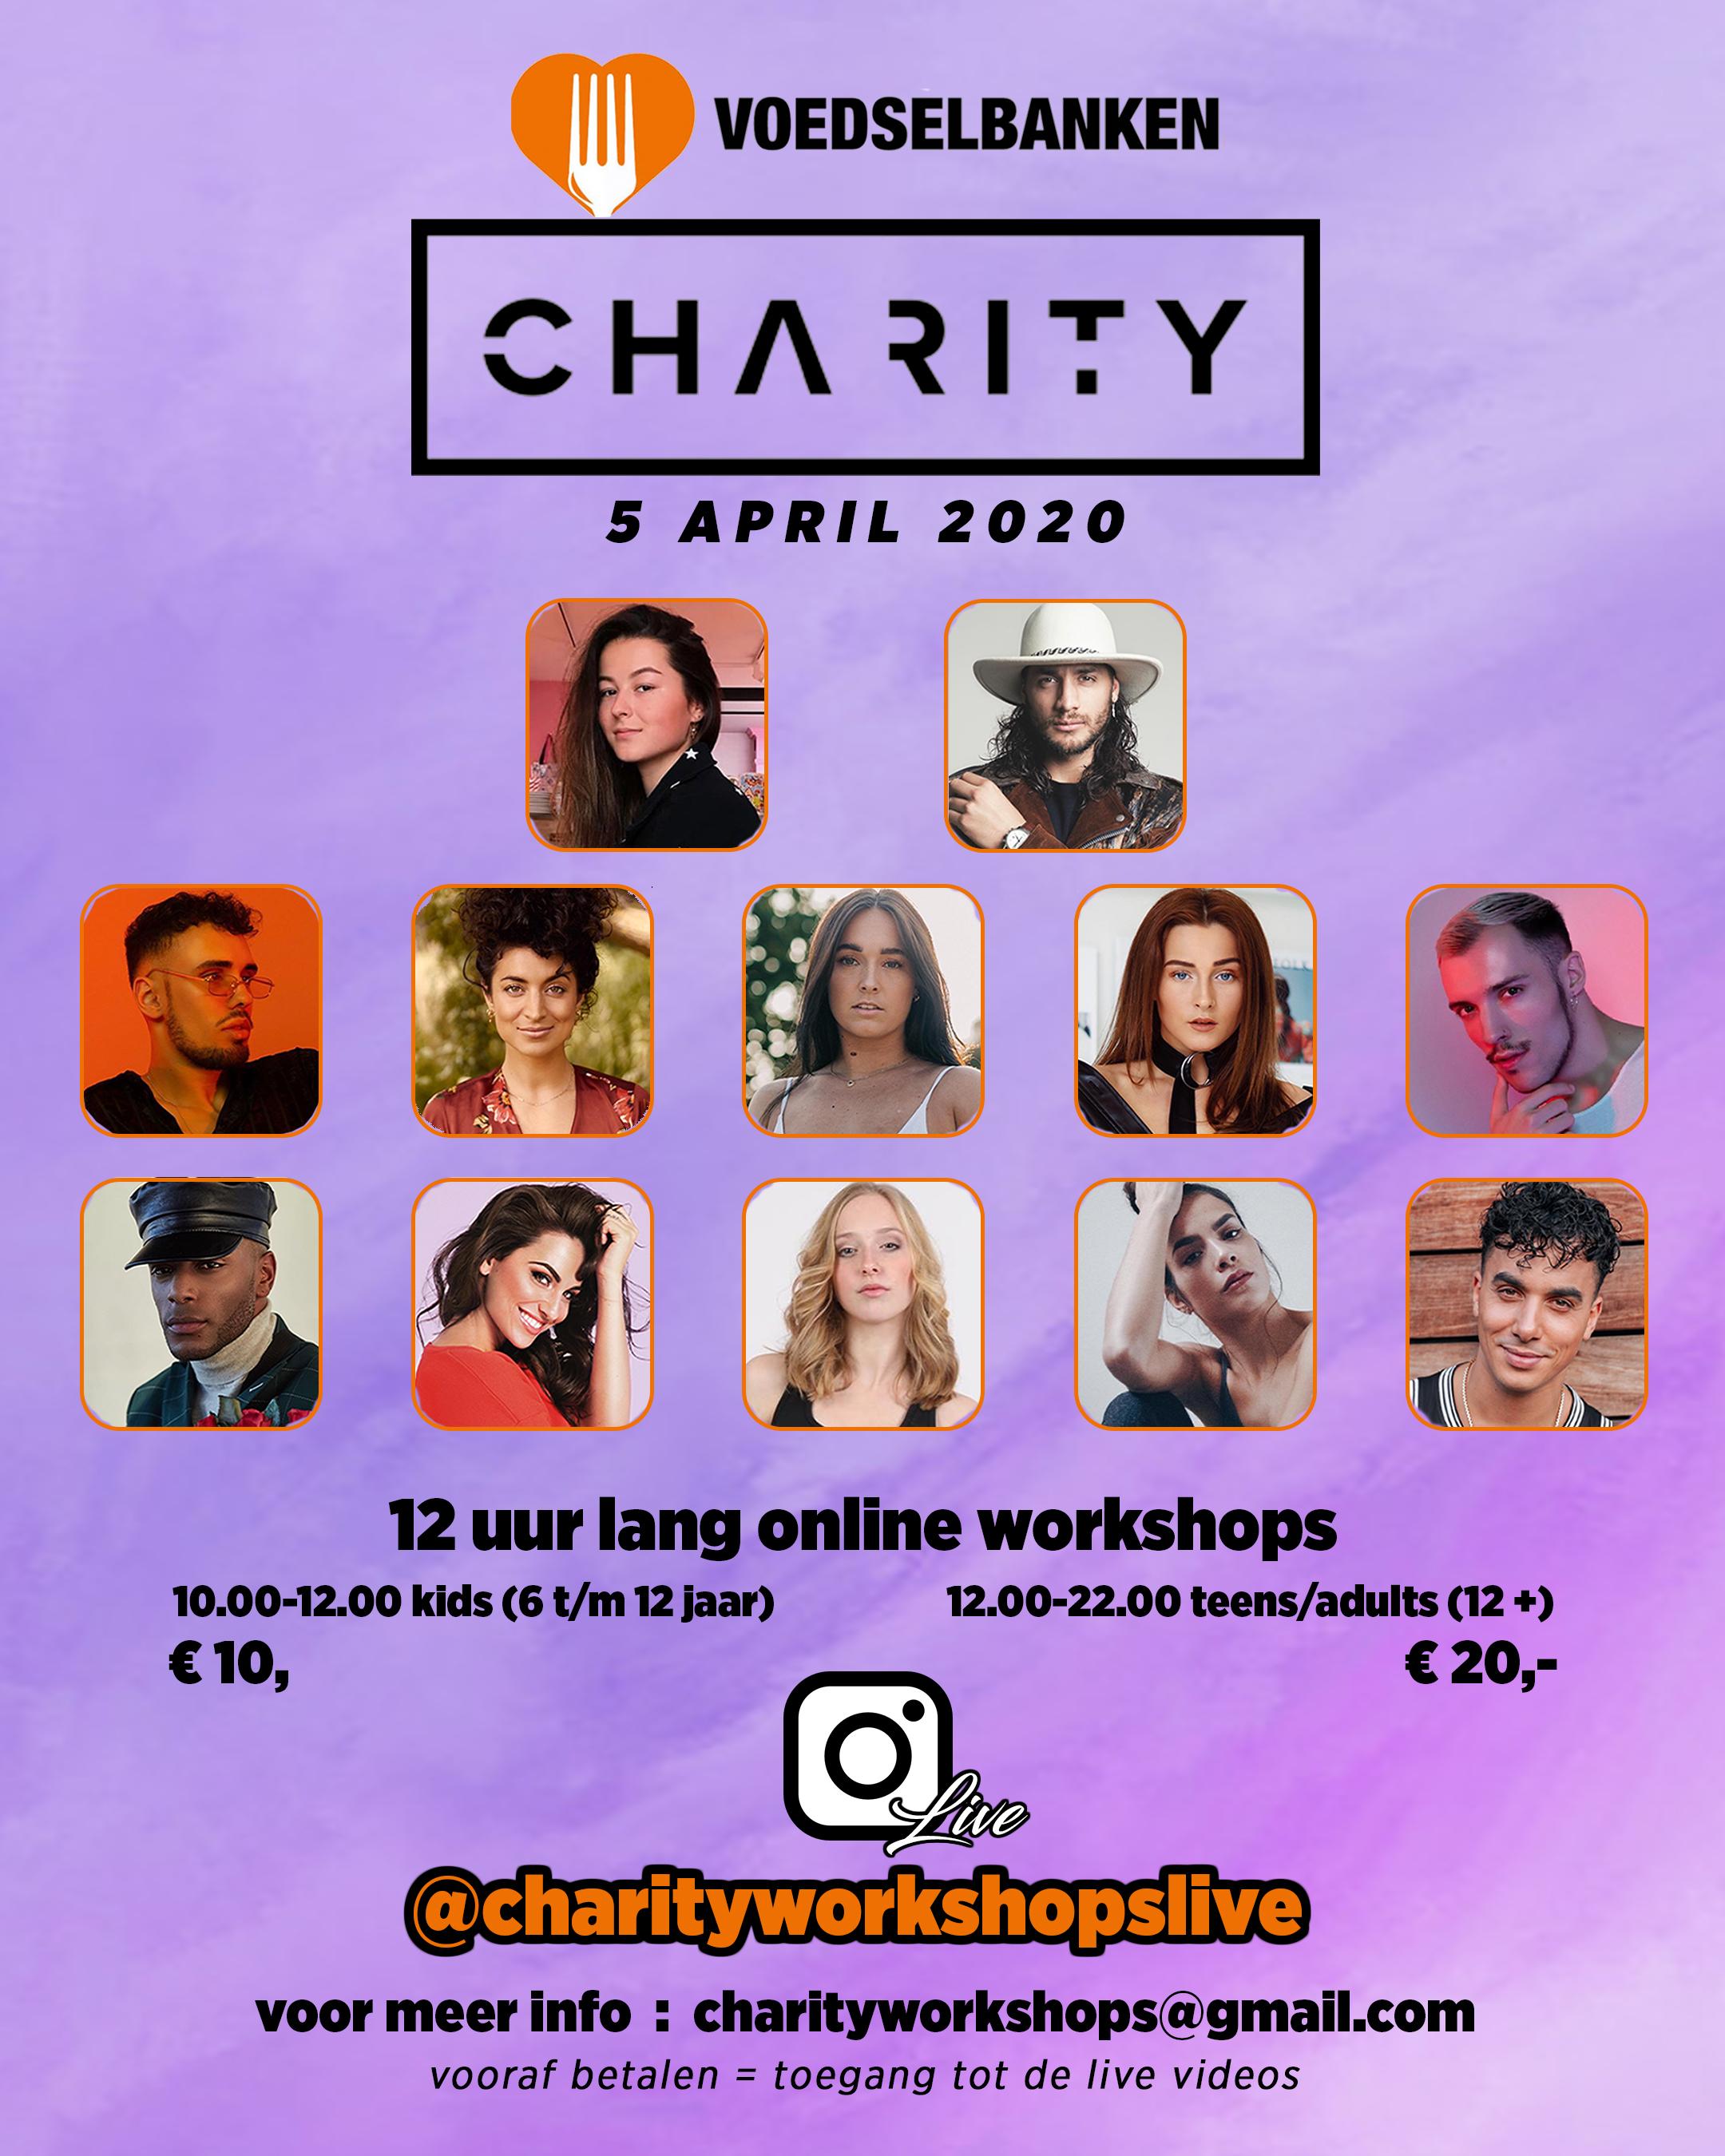 charity workshop, goede doel, dansles, choreografen, danslessen, goede doelen